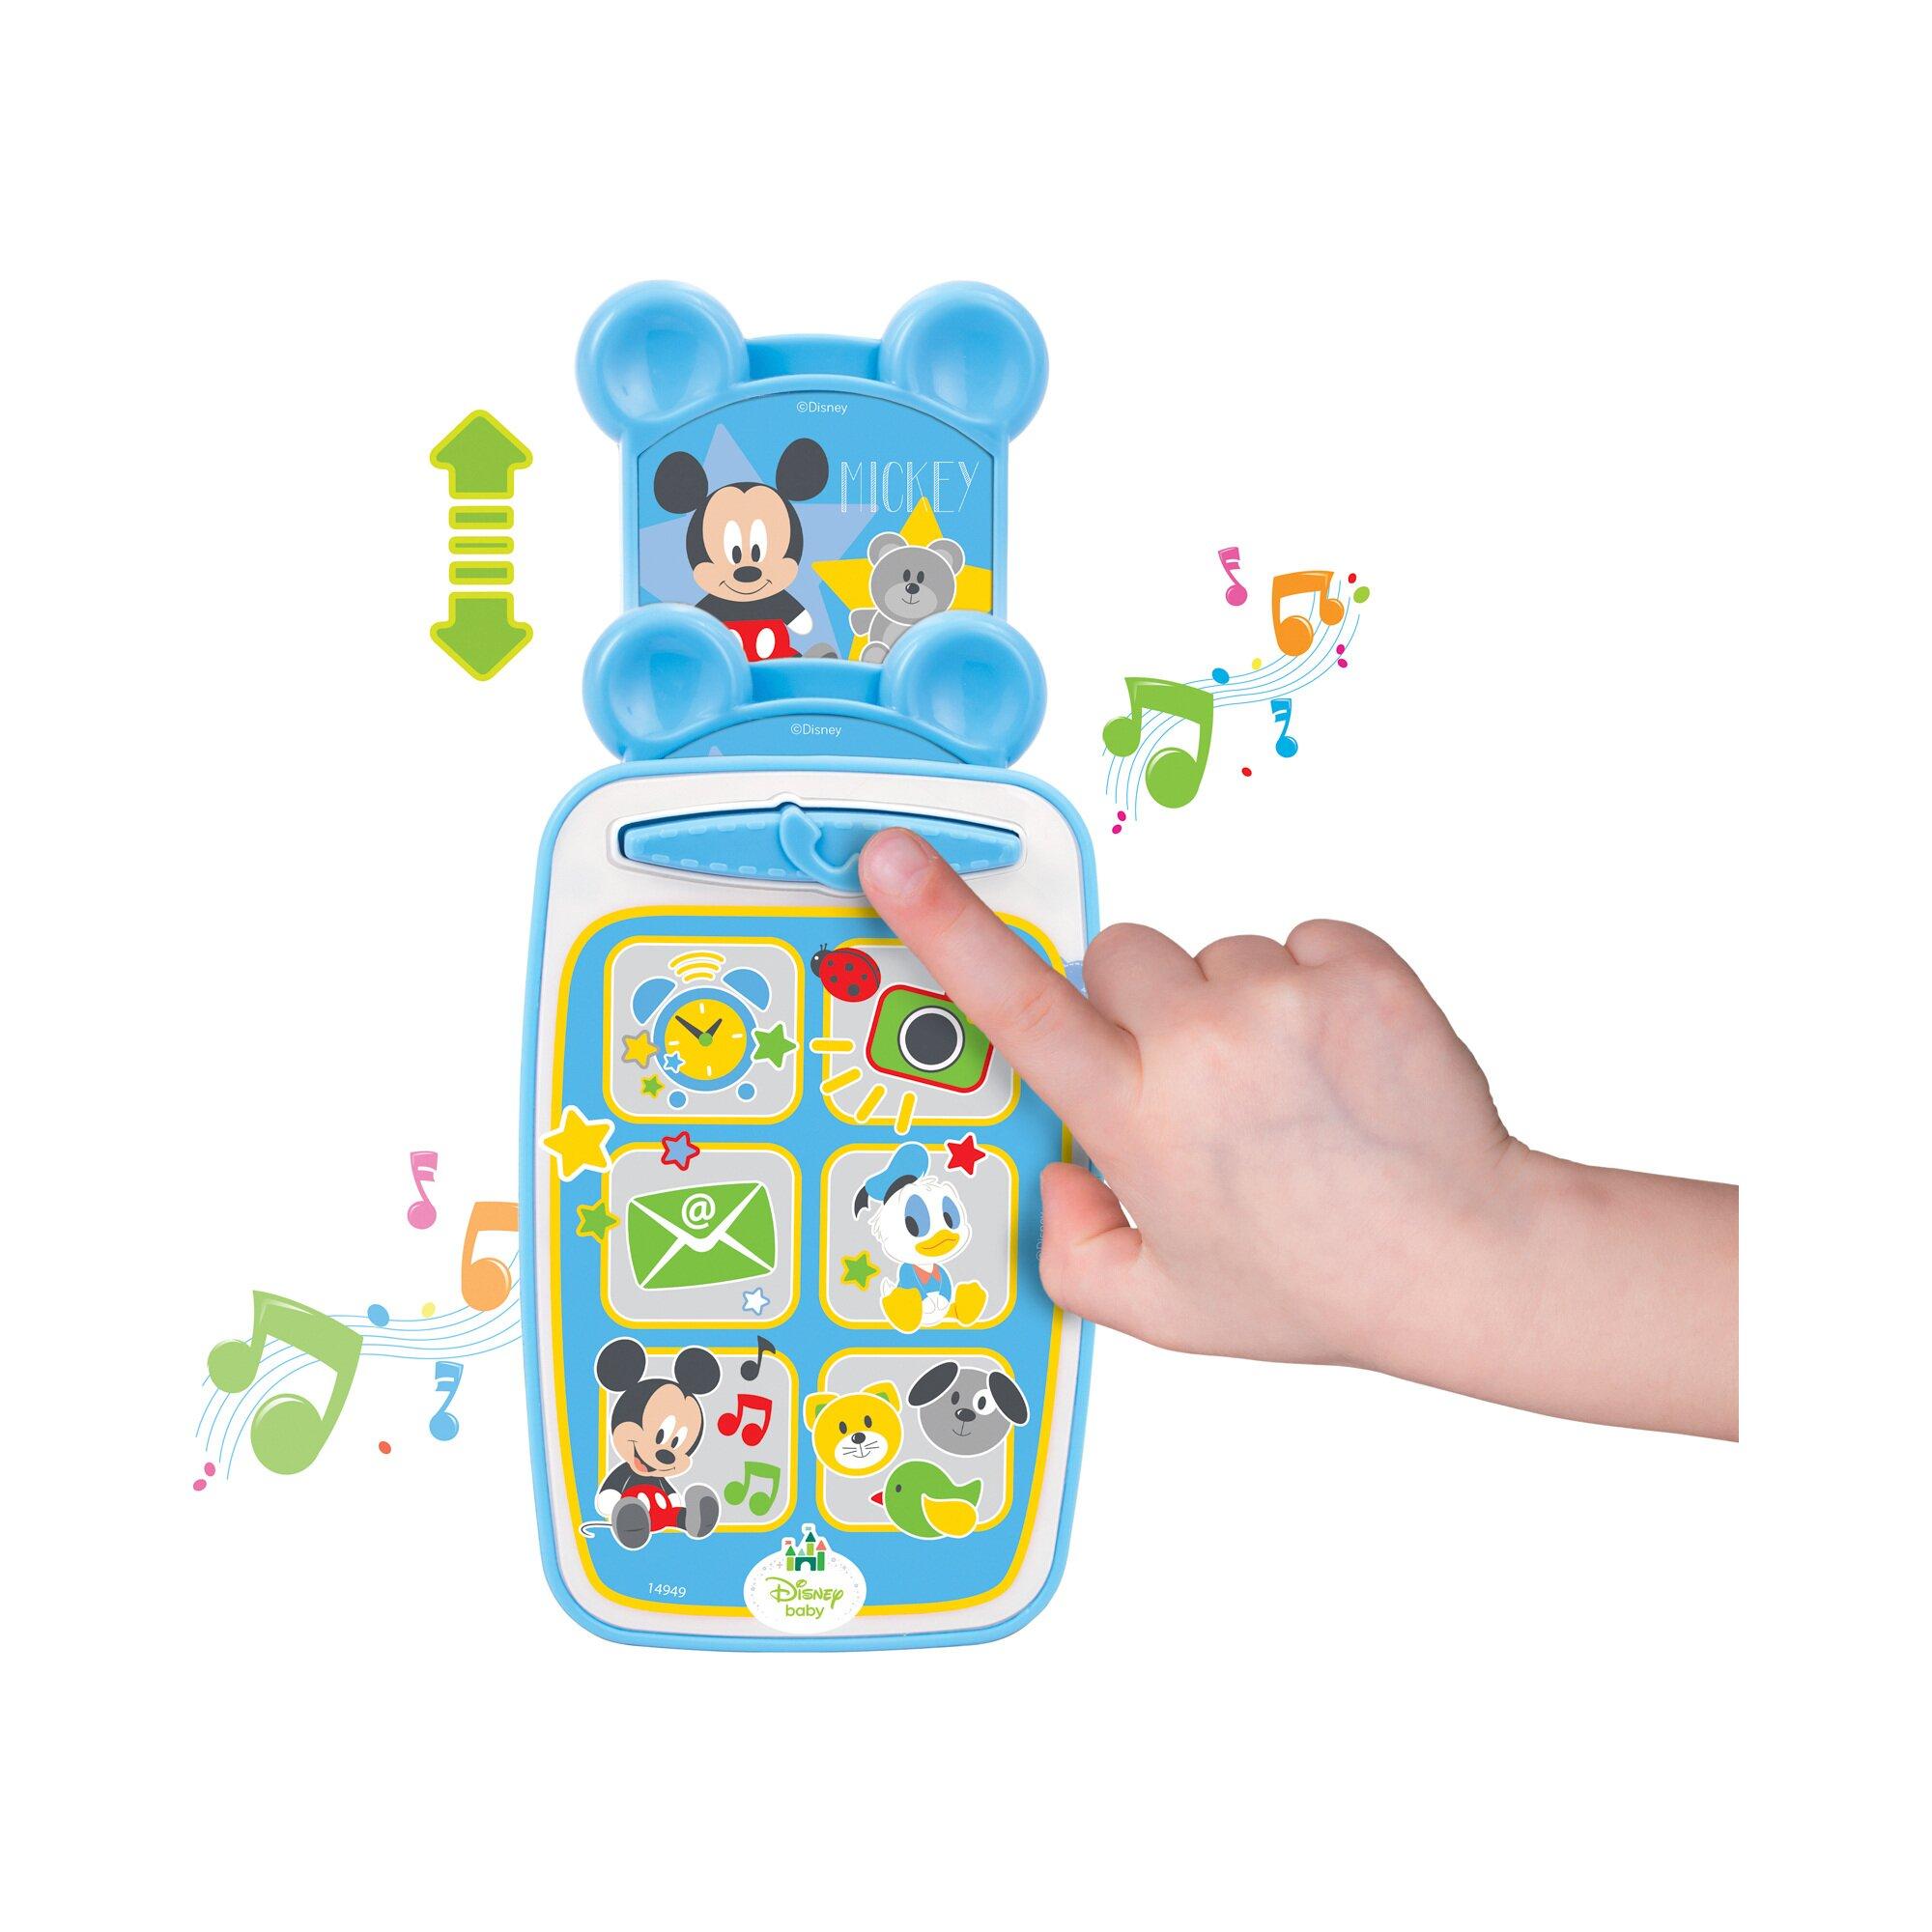 disney-baby-smartphone-baby-mickey